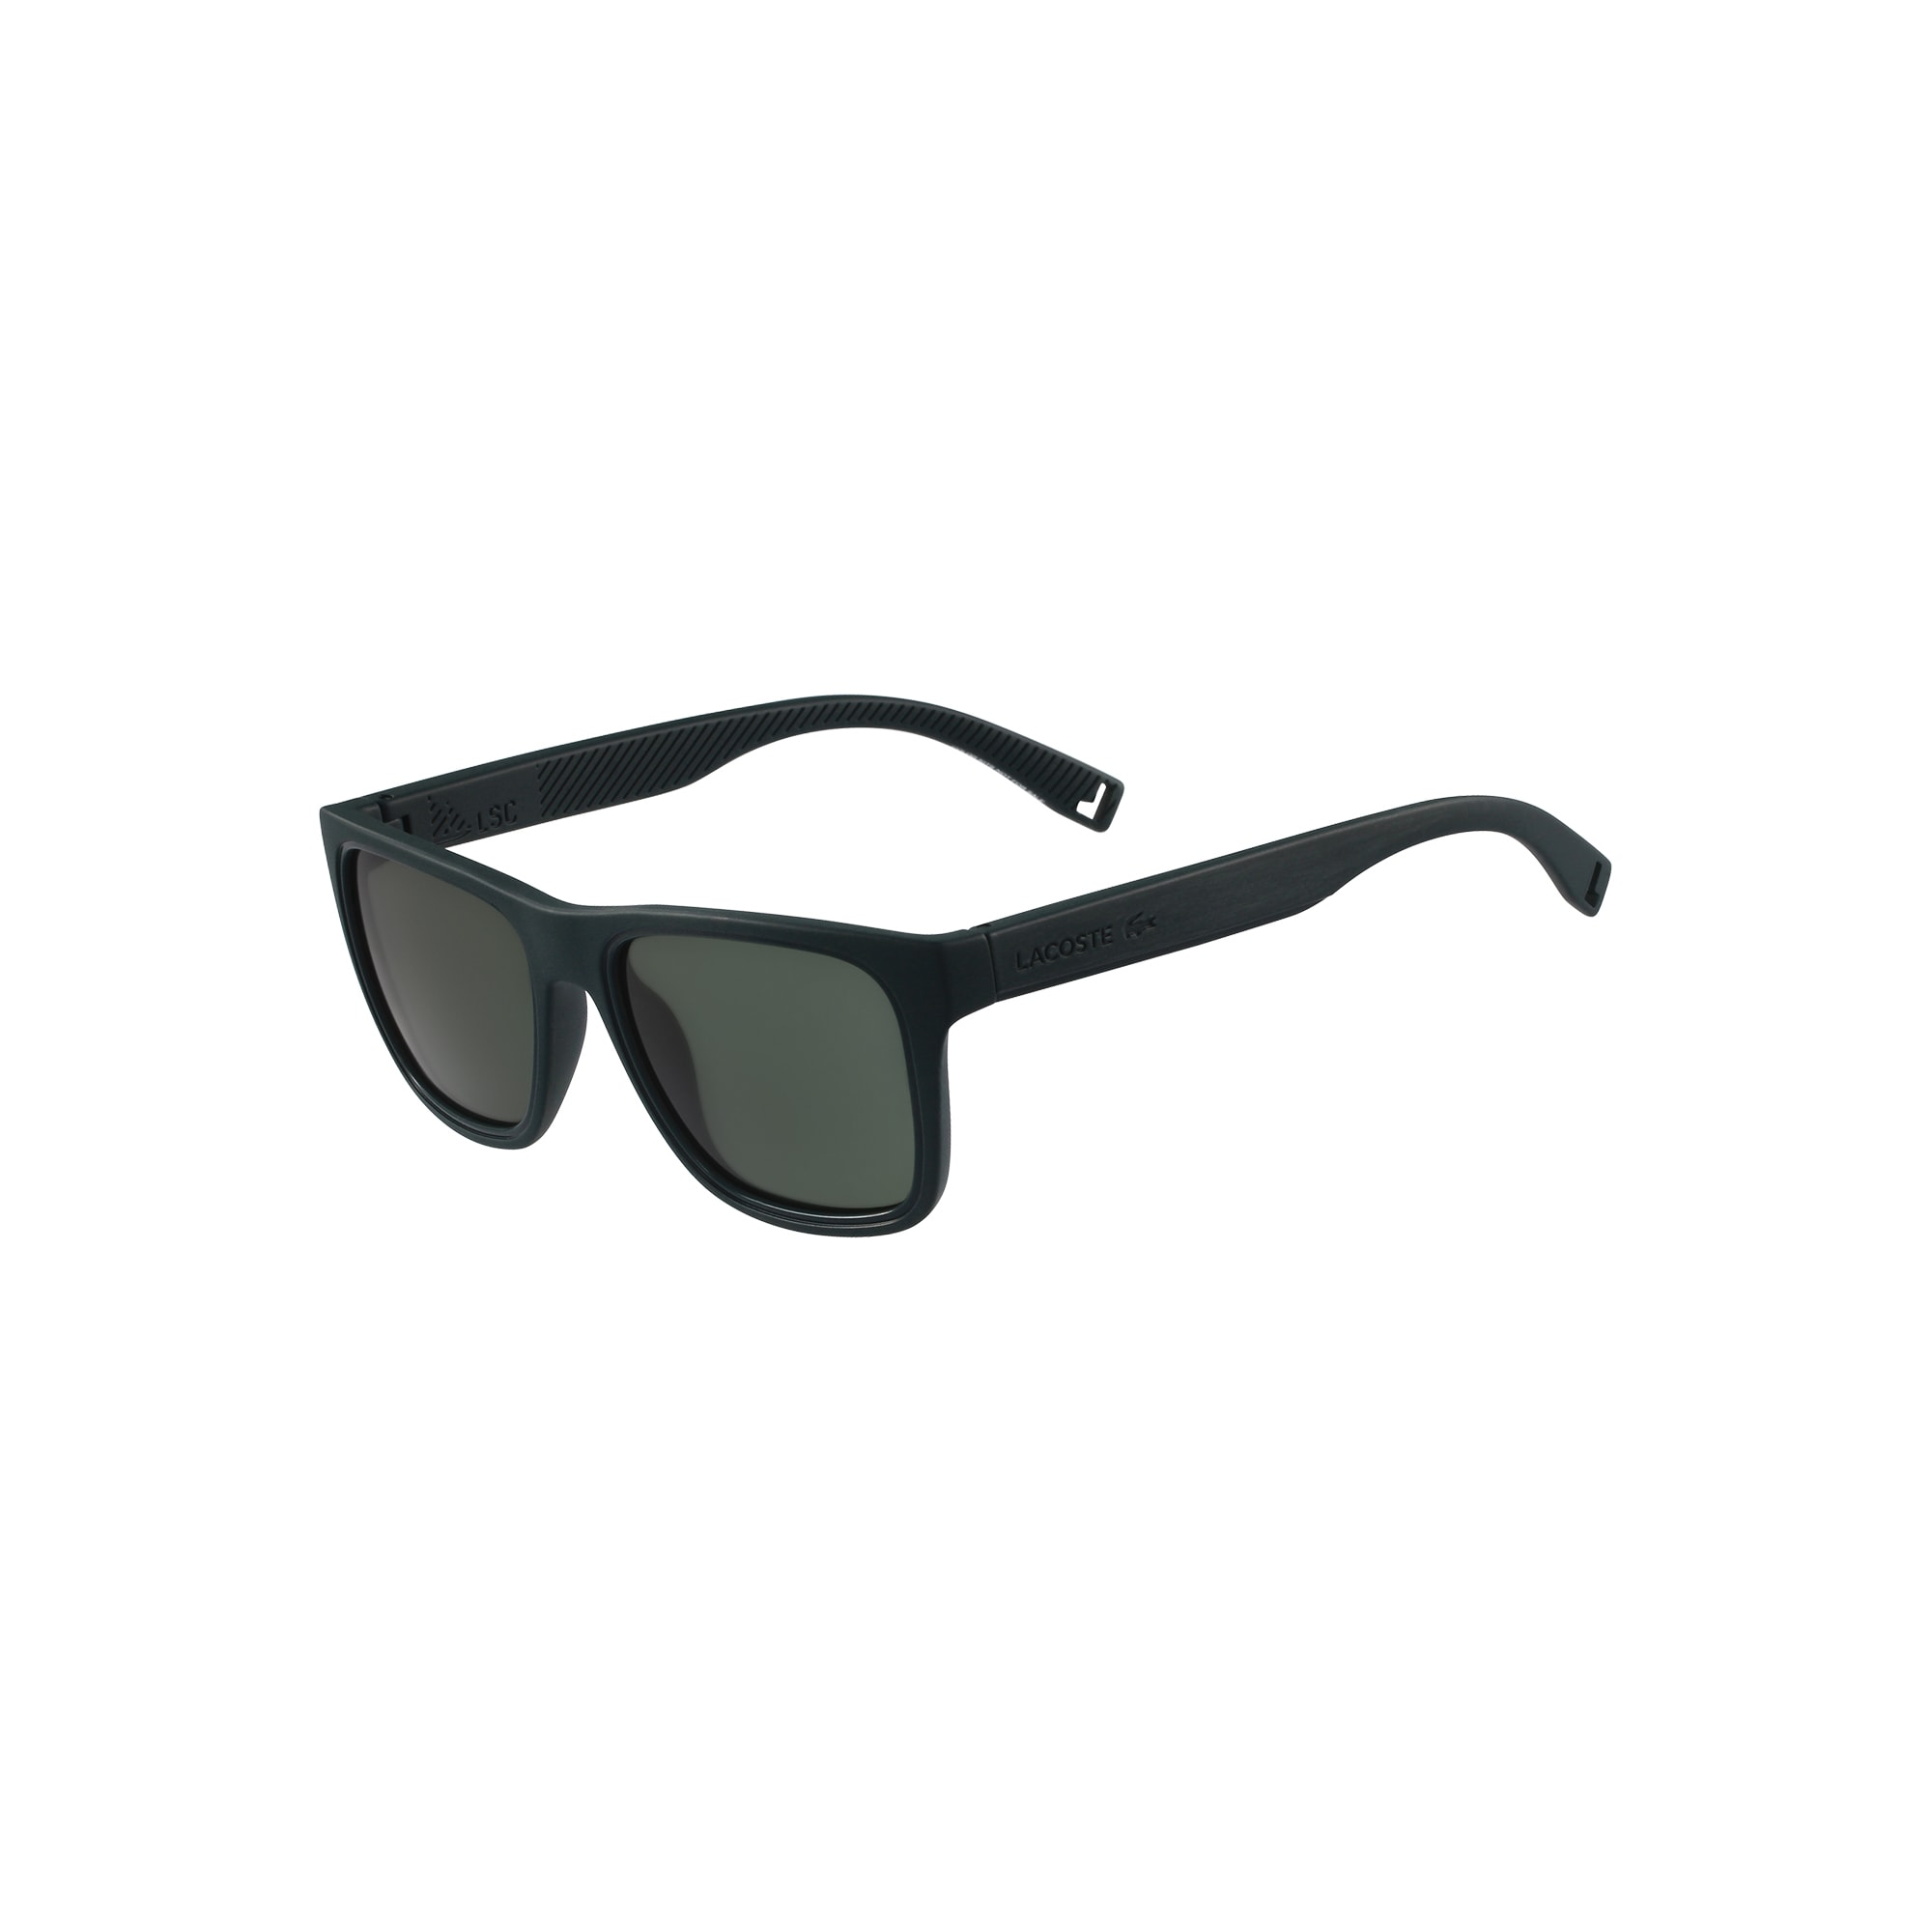 899c7ed144 Men s Floatable Color Block Sunglasses